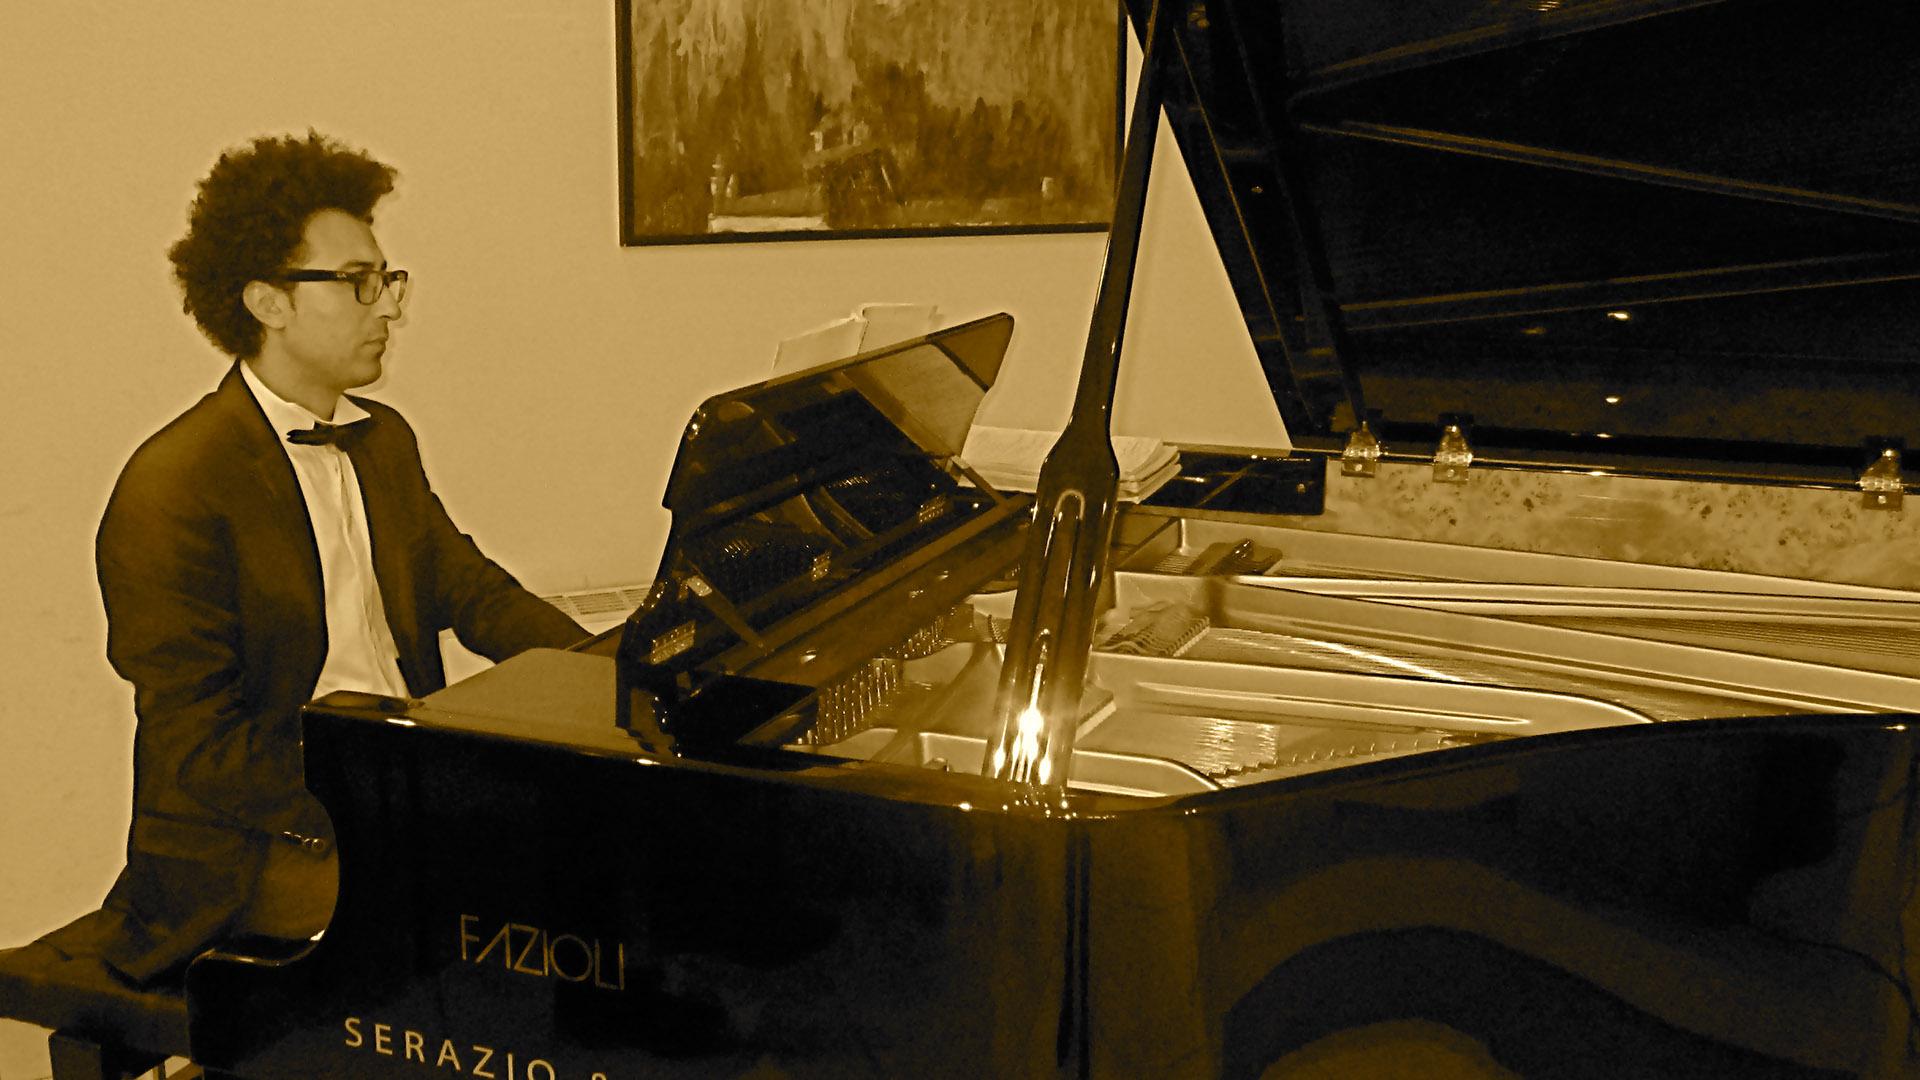 Giancarlo Aquilini - Chiavi d'Ascolto